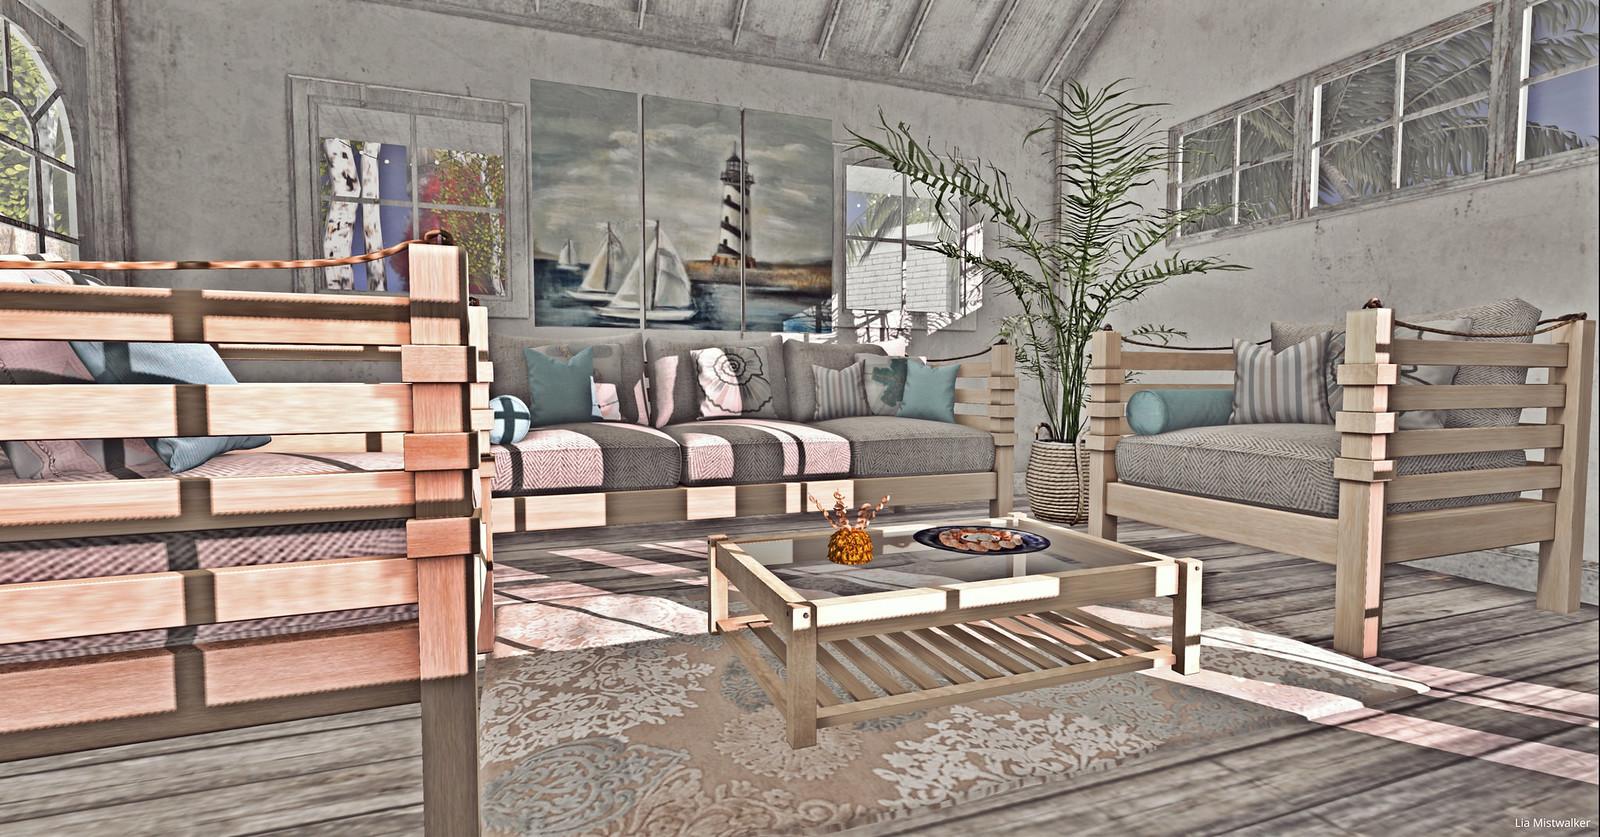 Home & Garden Therapy # 645